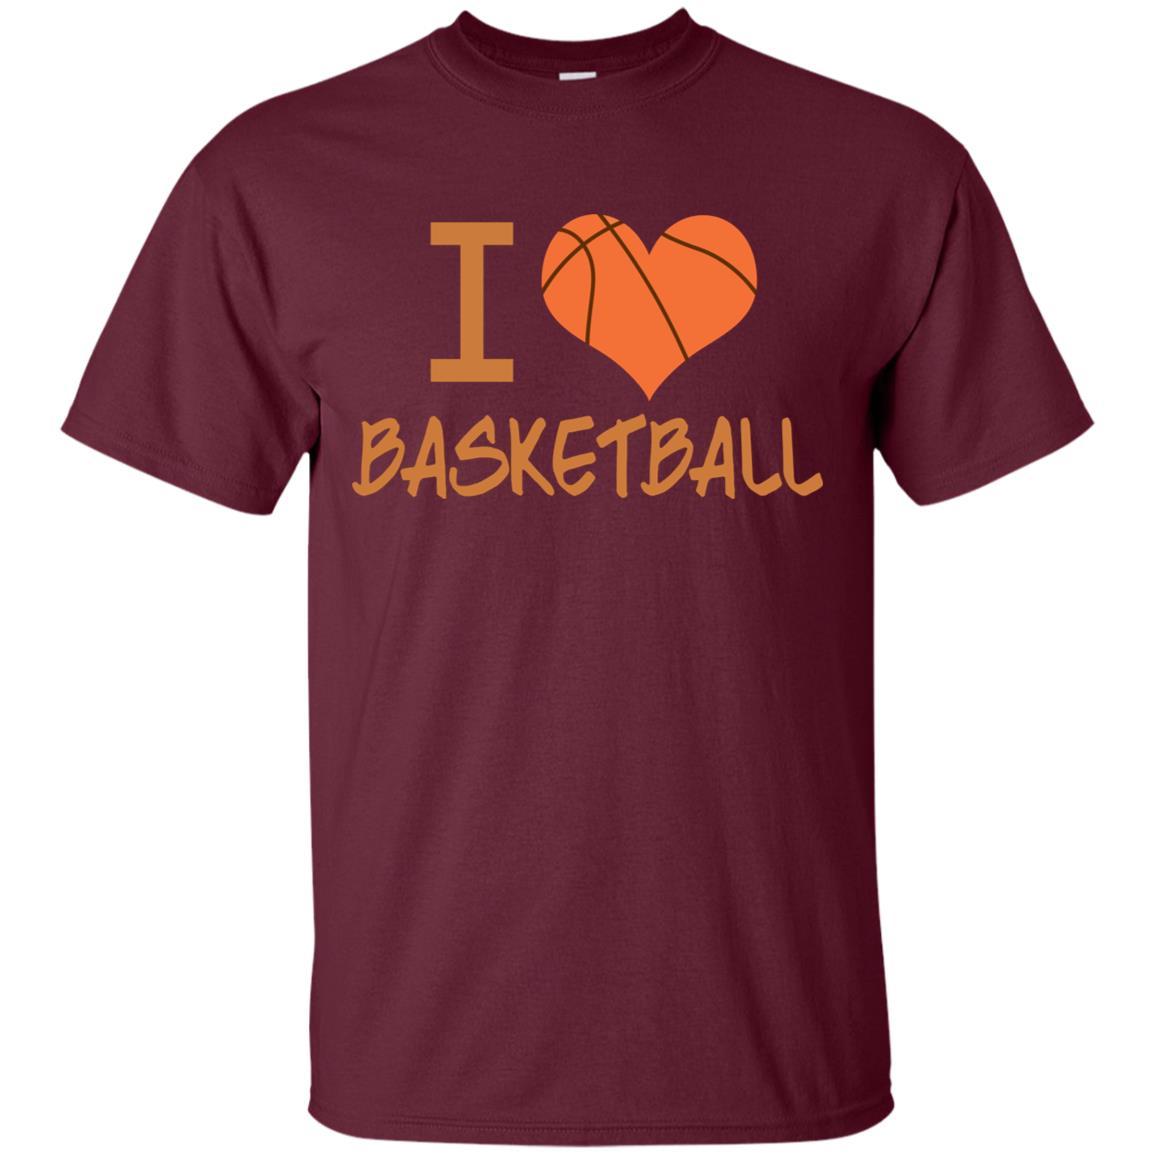 I Love Basketball Unisex Short Sleeve